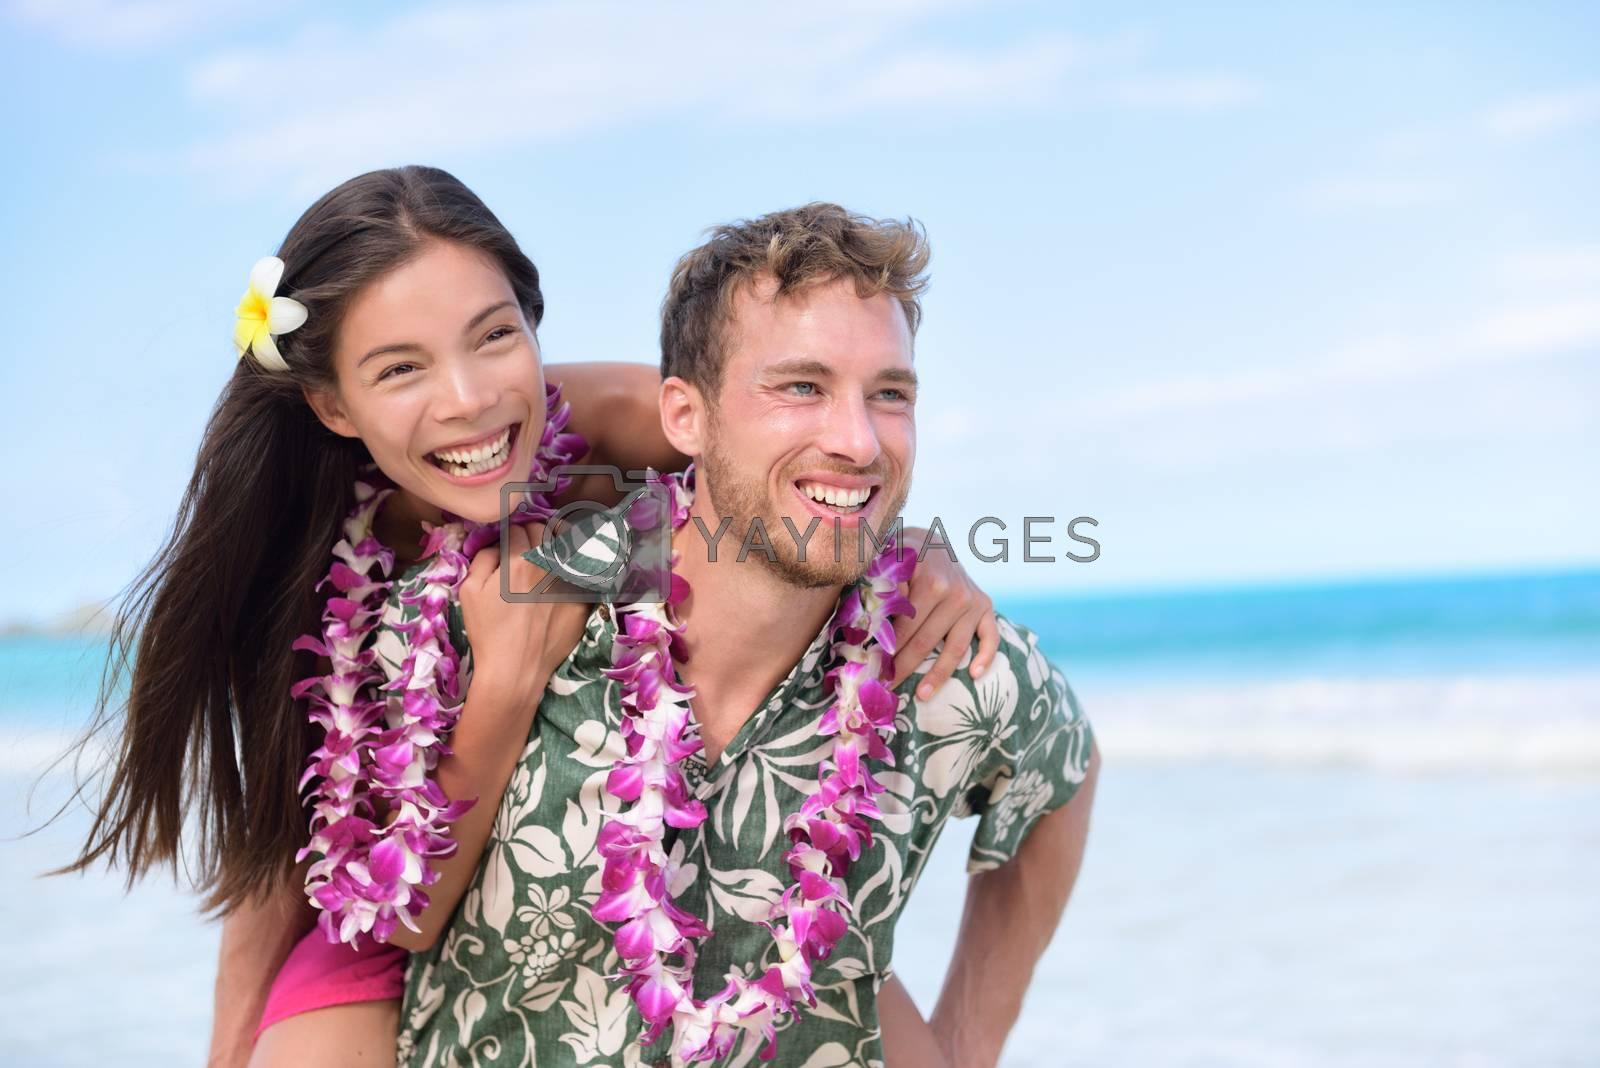 Happy beach couple having fun piggybacking and laughing on Hawaii travel holiday. Beautiful Asian mixed race woman abd Caucasian boyfriend wearing traditional Hawaiian lei on Oahu, Hawaii, USA.